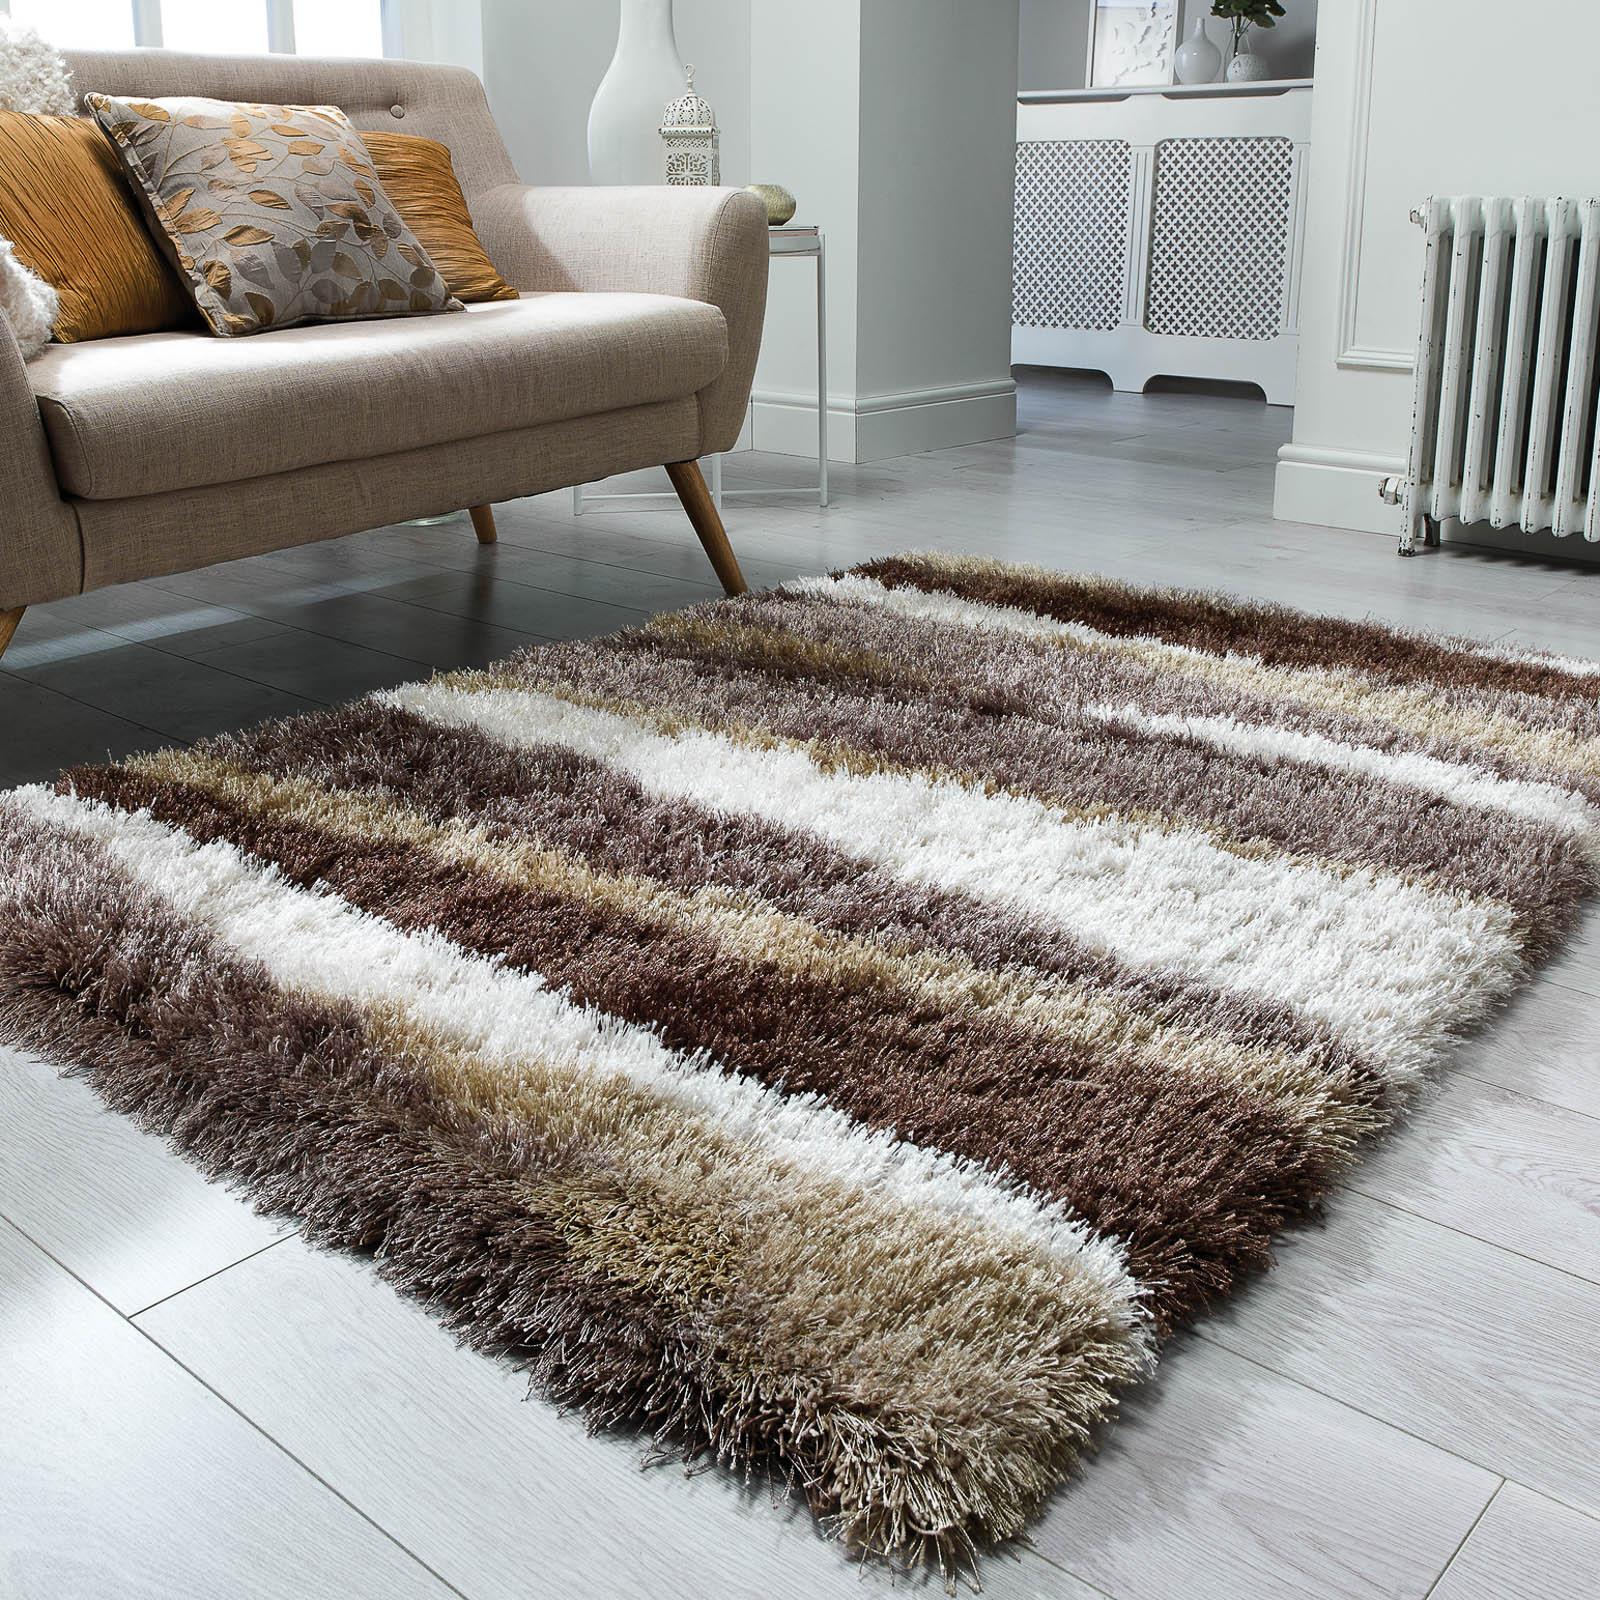 shaggy rugs santa cruz ZZHFBCX